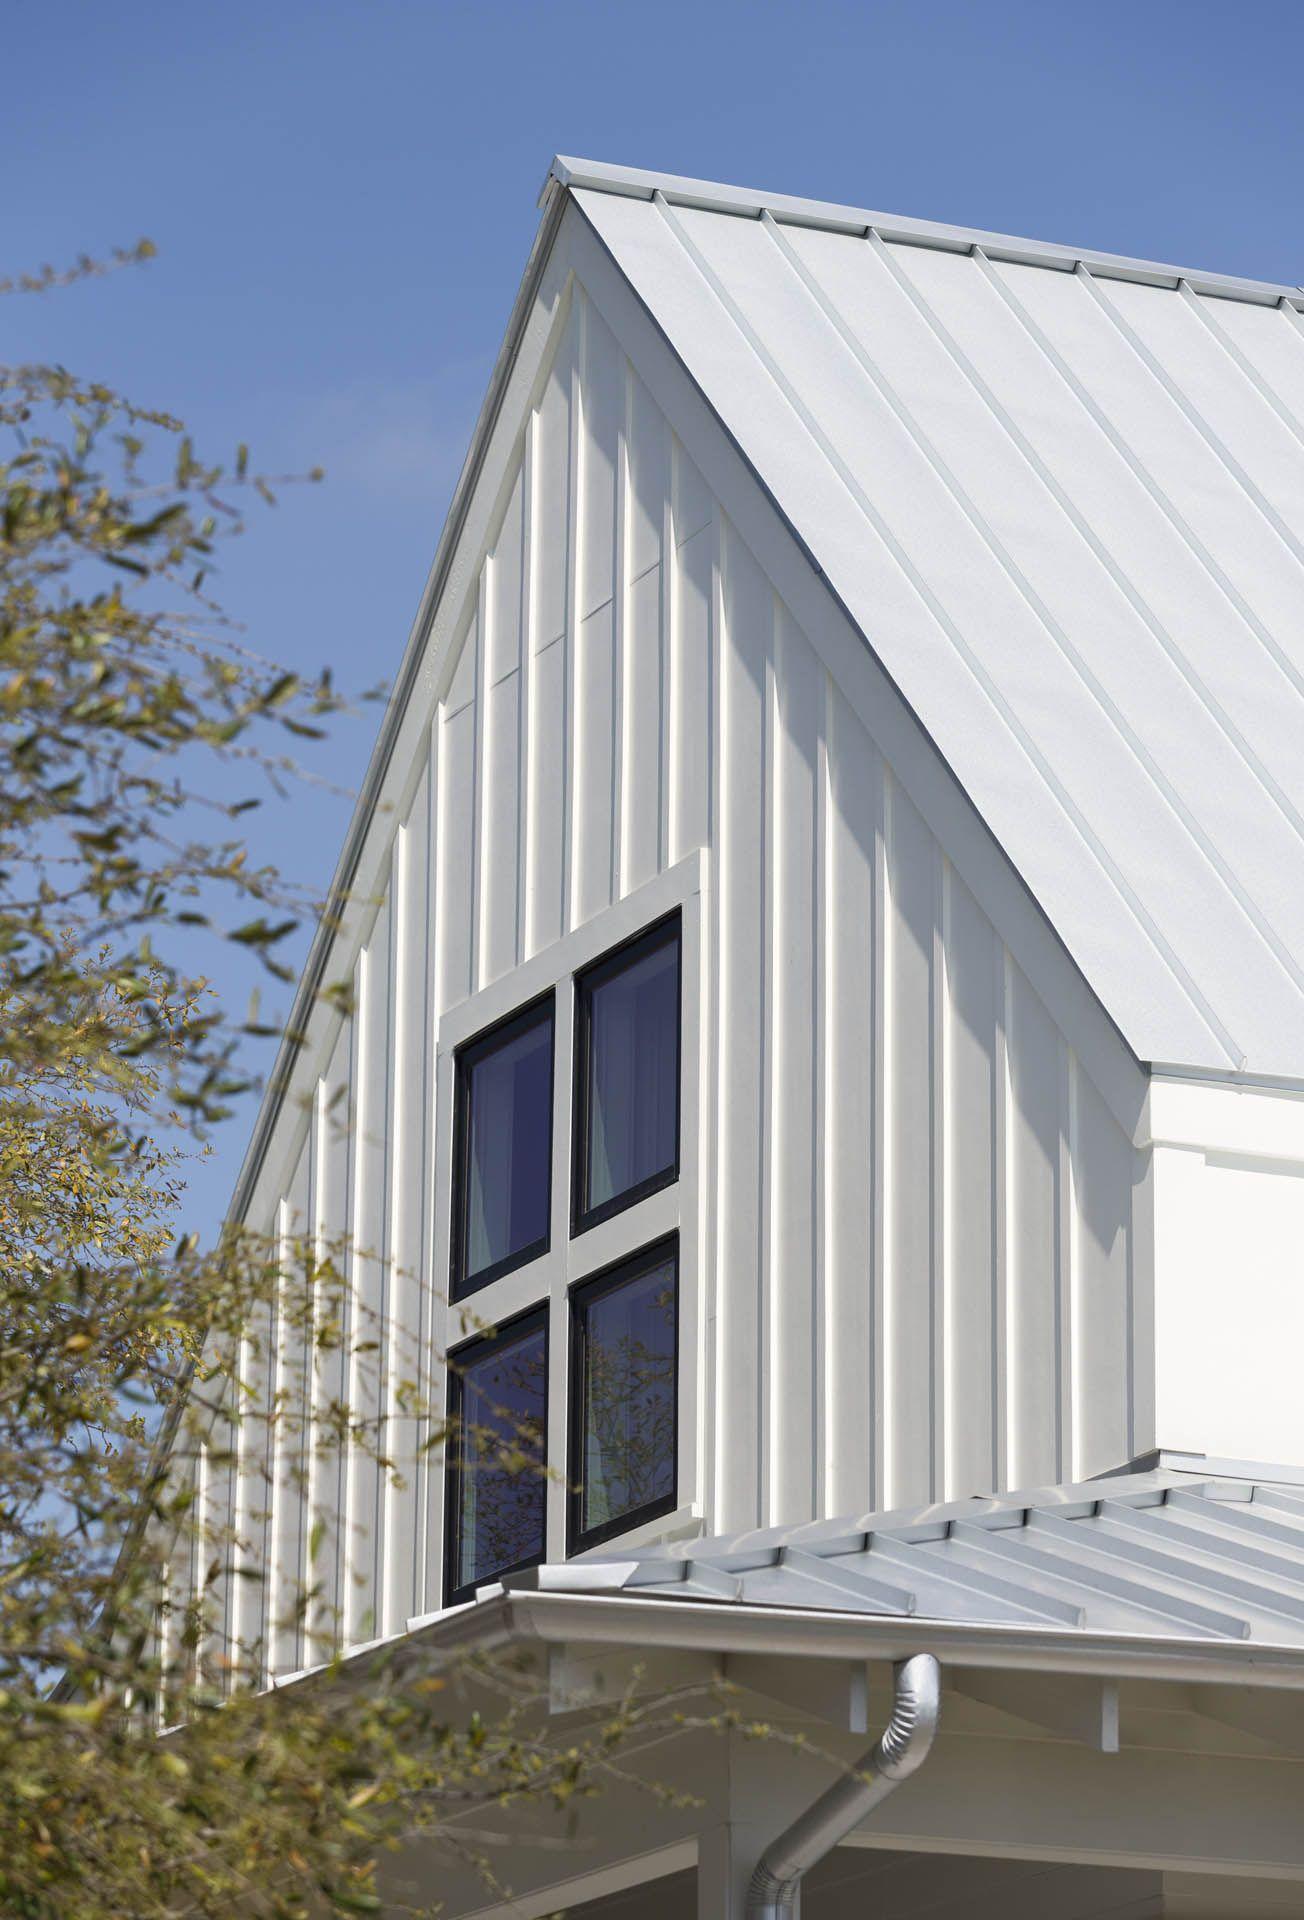 Farmhouse Roof Exterior Farmhouse With Vertical Metal Roof Vertical Metal Roof Beige Siding Jpg Metal Roof Houses Cottage House Exterior Metal Building Homes